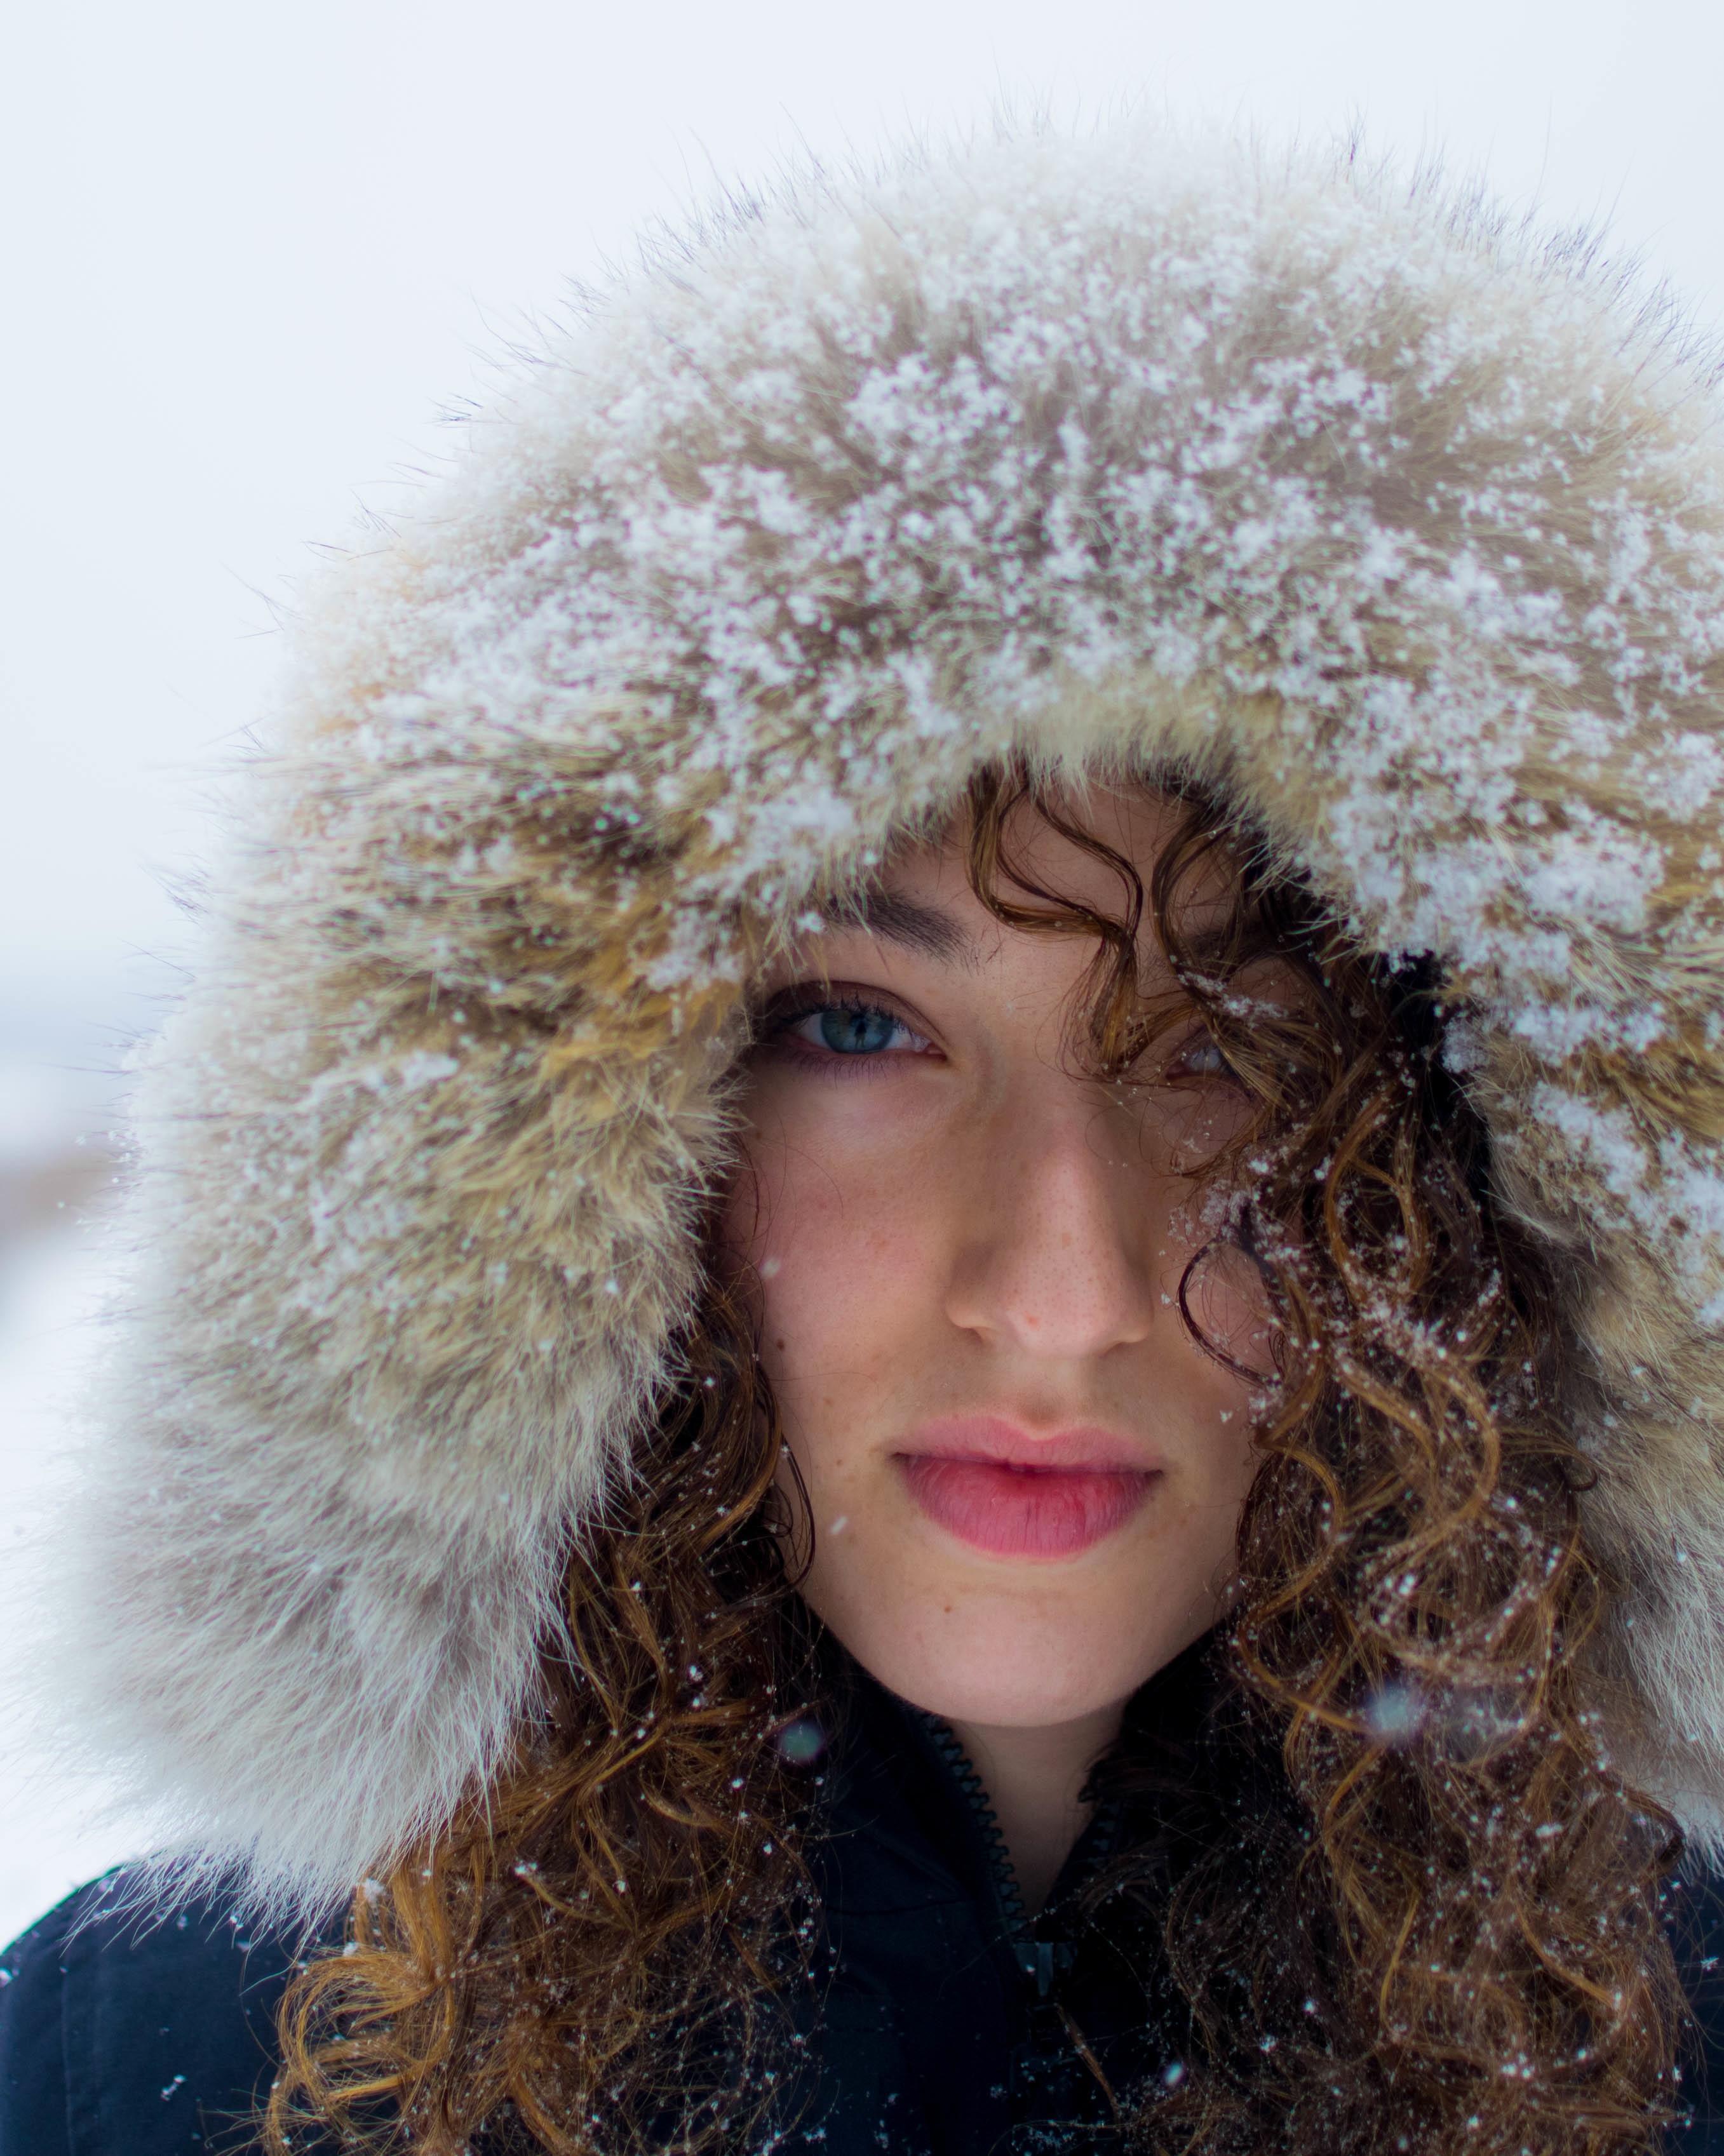 girl-winter-snow-hood-0116